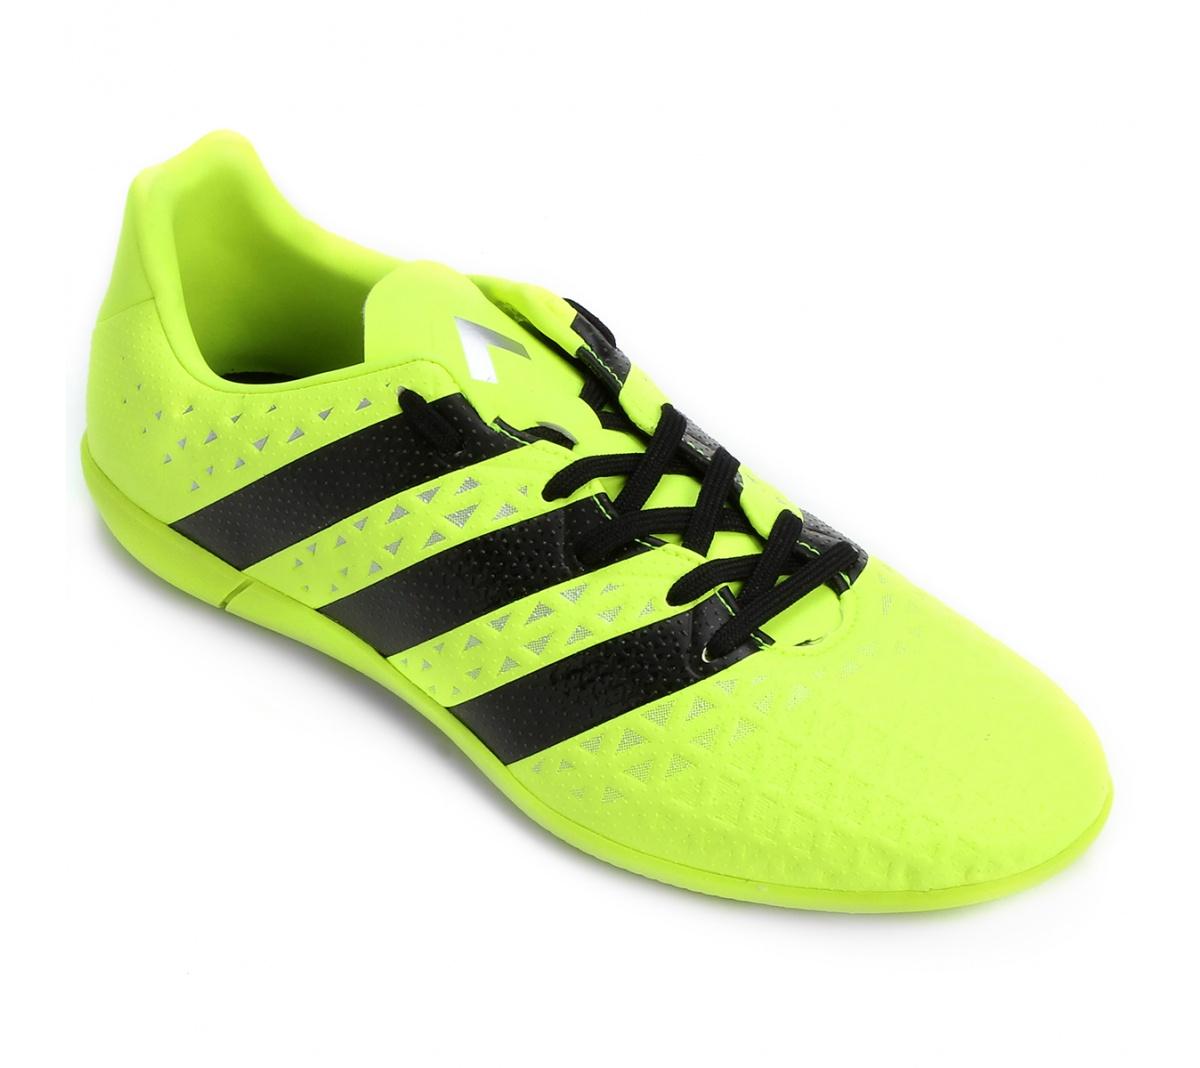 6297e31574 Tenis Adidas Ace 16.3 Futsal Tenis Adidas Ace 16.3 Futsal ...